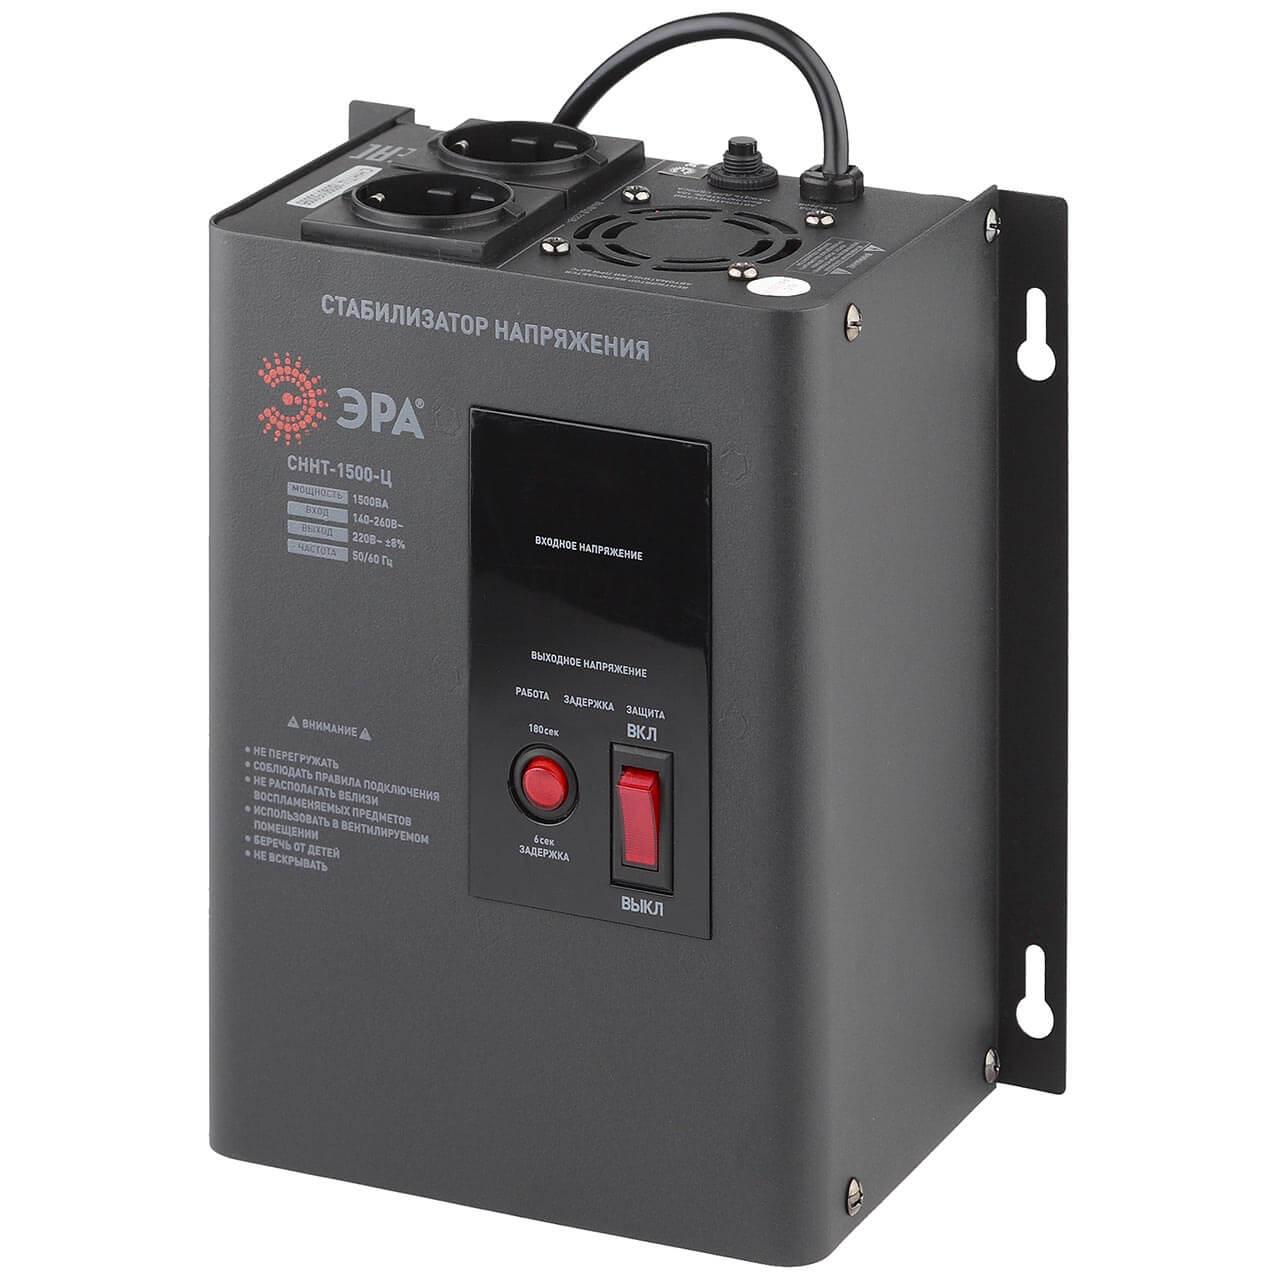 Стабилизатор напряжения ЭРА СННТ-1500-Ц цена